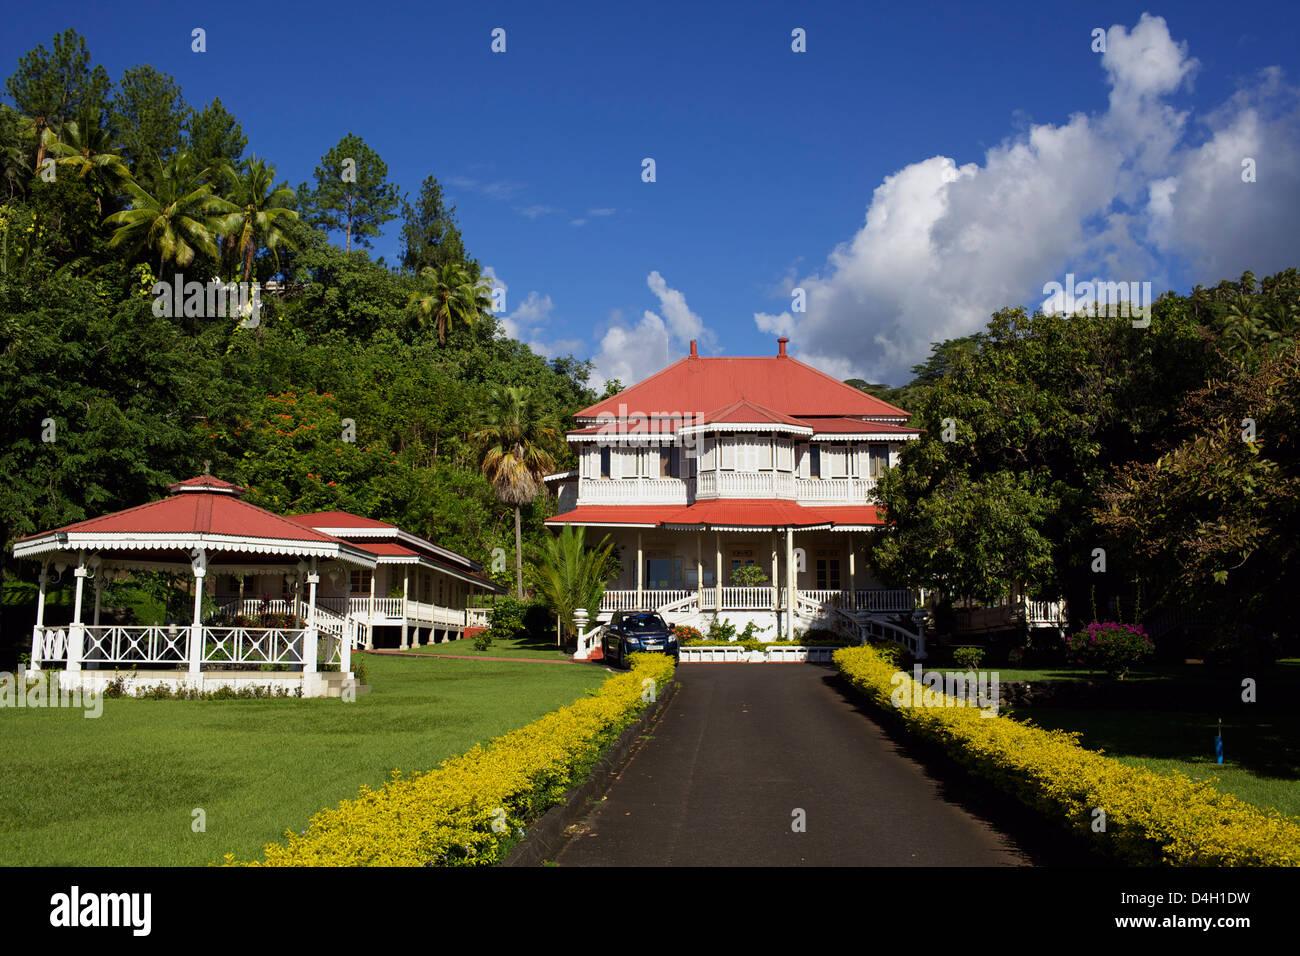 Classical colonial villa on the east coast of Tahiti island, French Polynesia - Stock Image